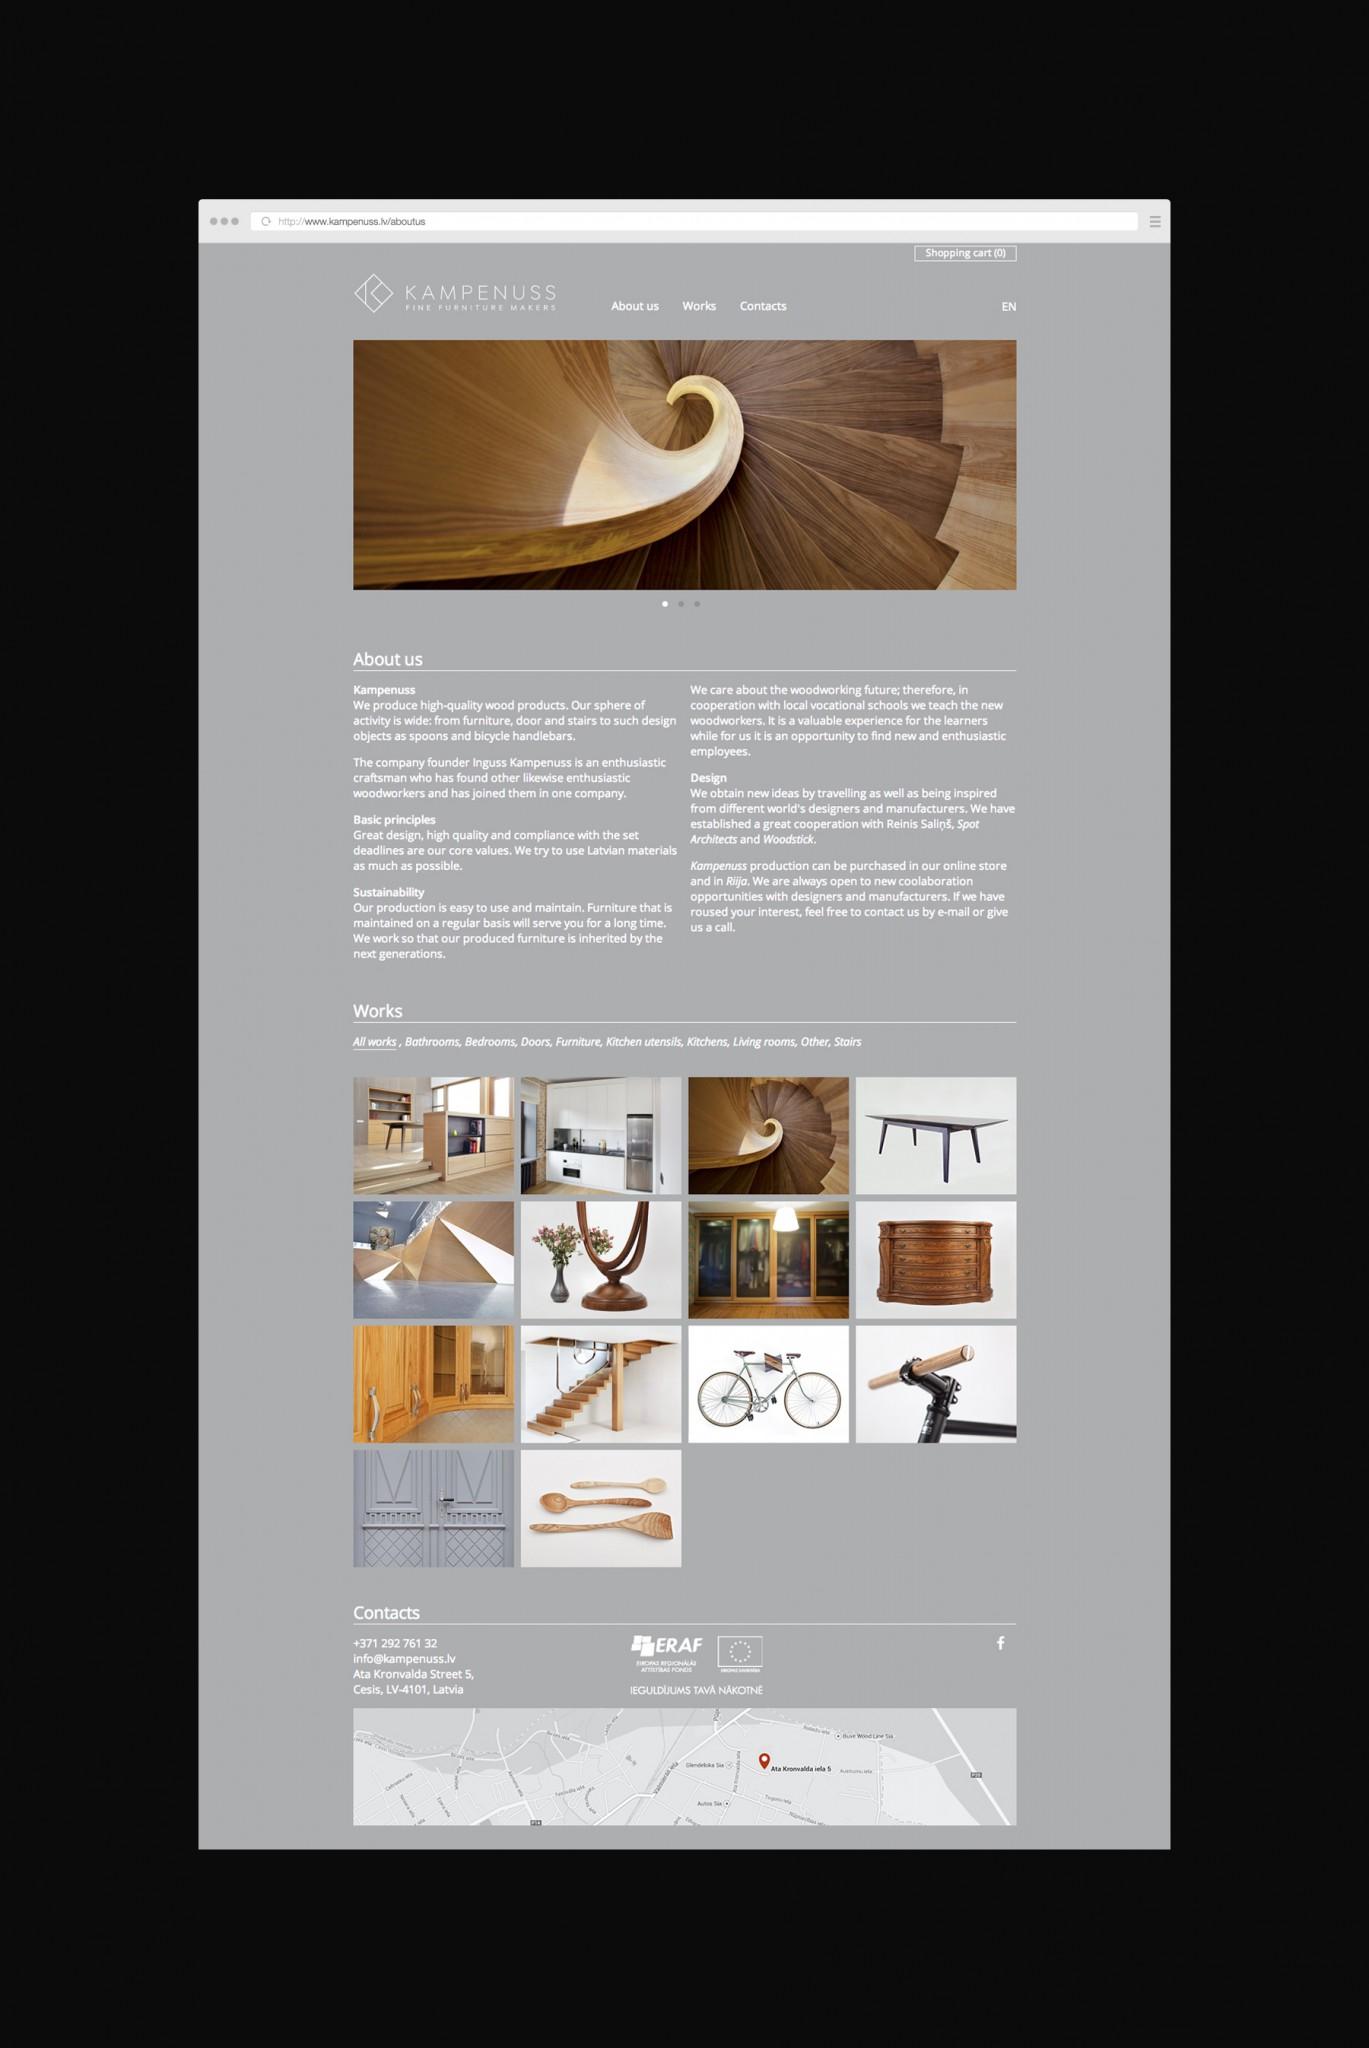 kampenuss_portfolio_web_44 copy